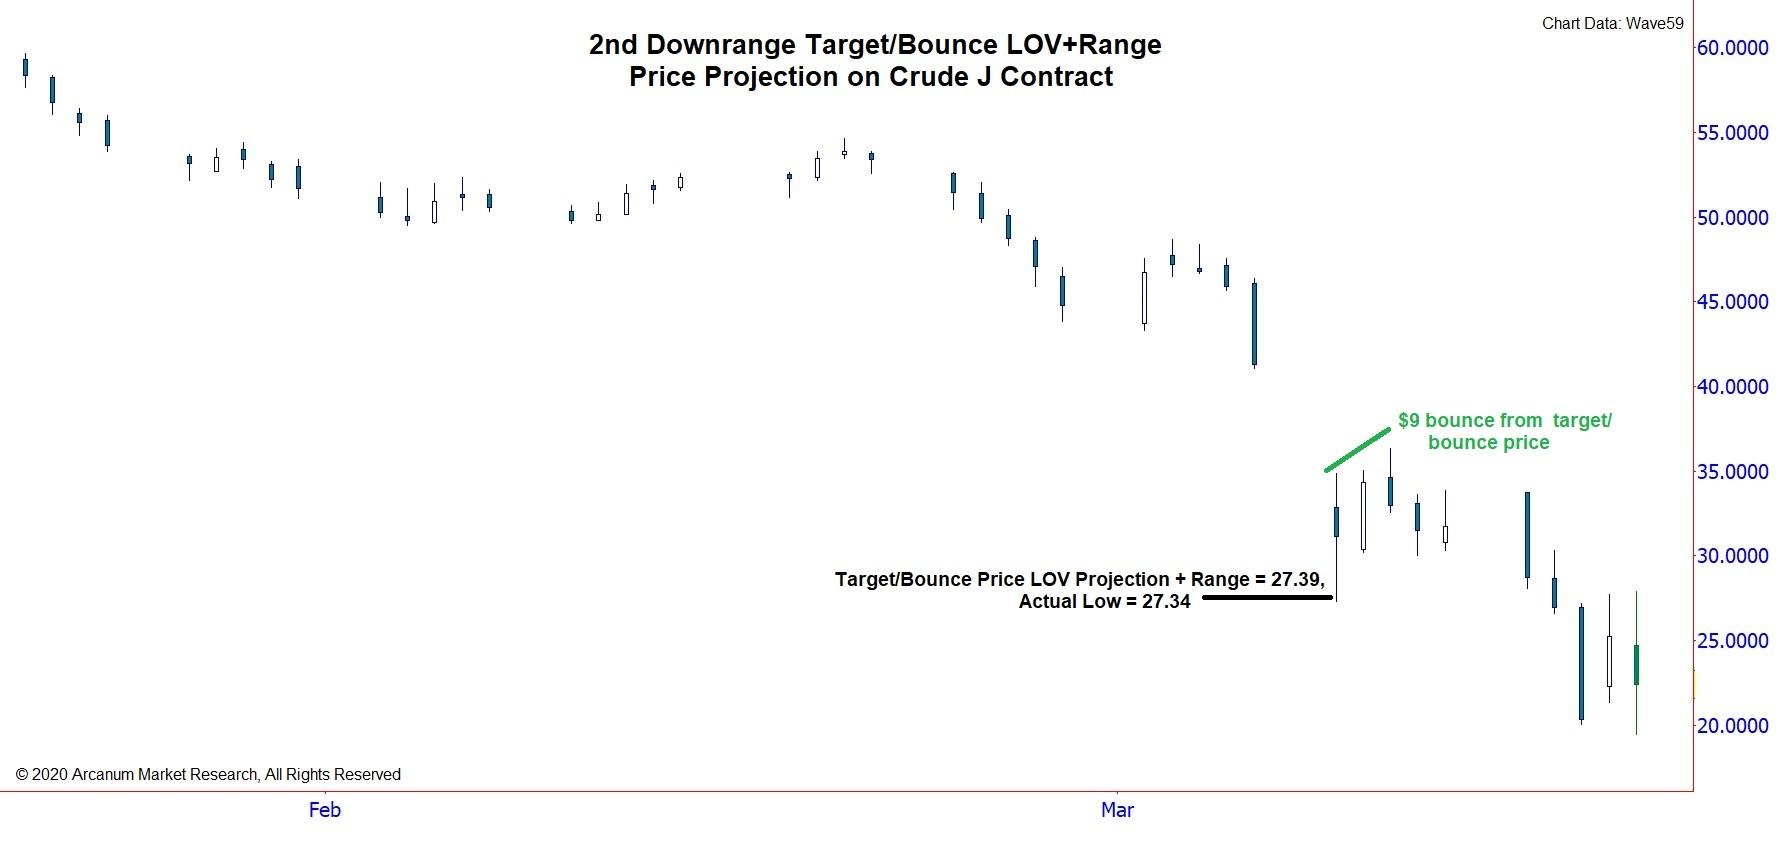 2nd Downrange Target/Bounce J Contract